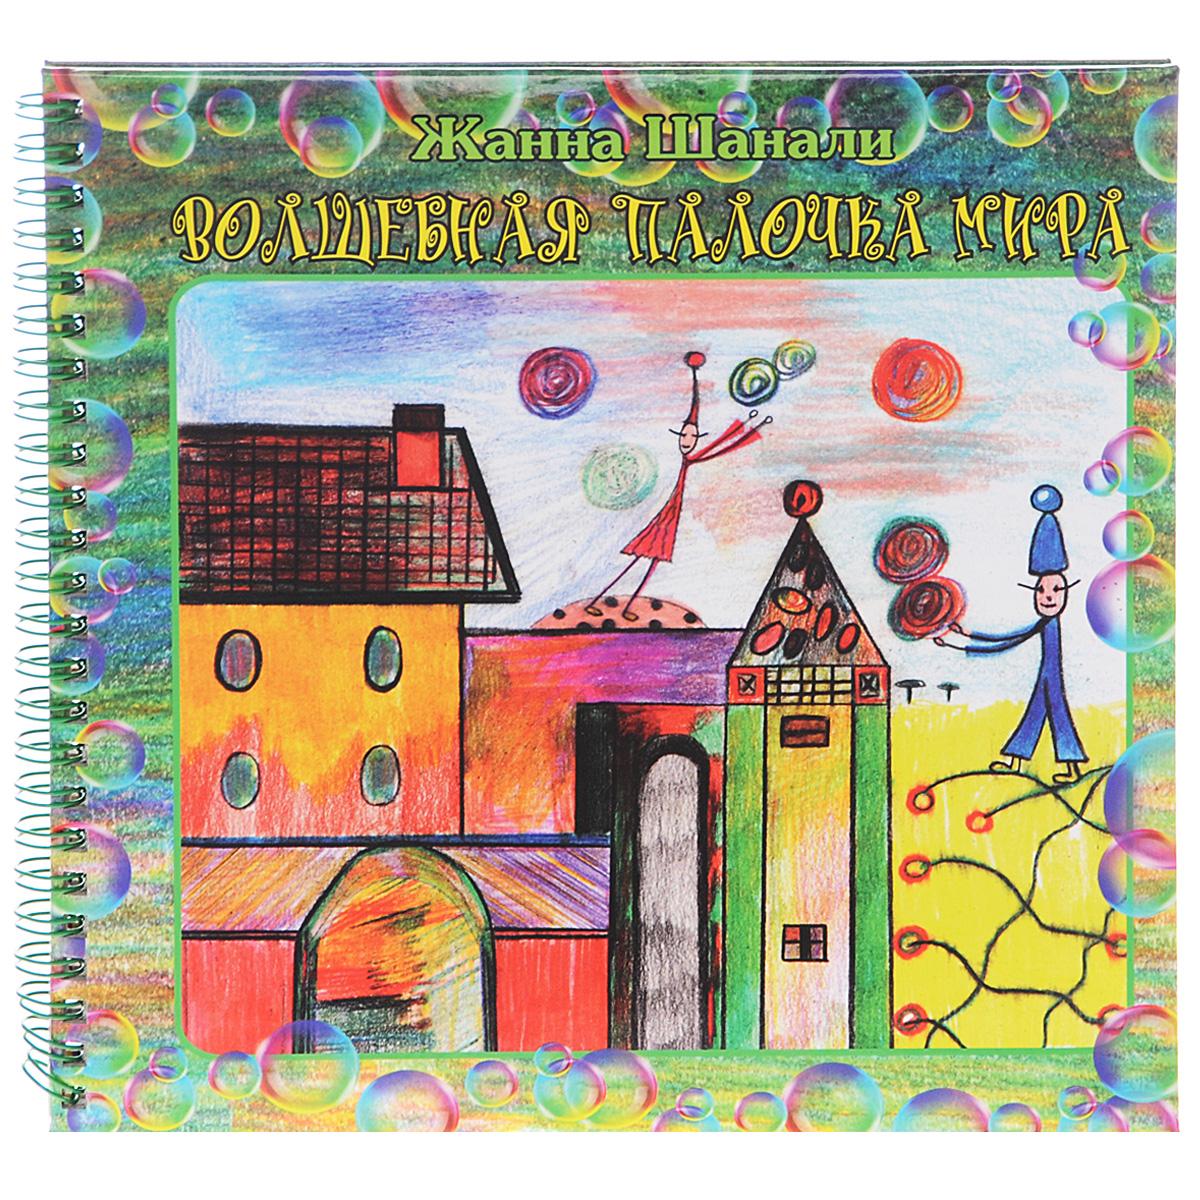 Жанна Шанали Волшебная палочка мира ISBN: 978-5-000390-894 shenzhen волшебная палочка свет 668 1 б54295